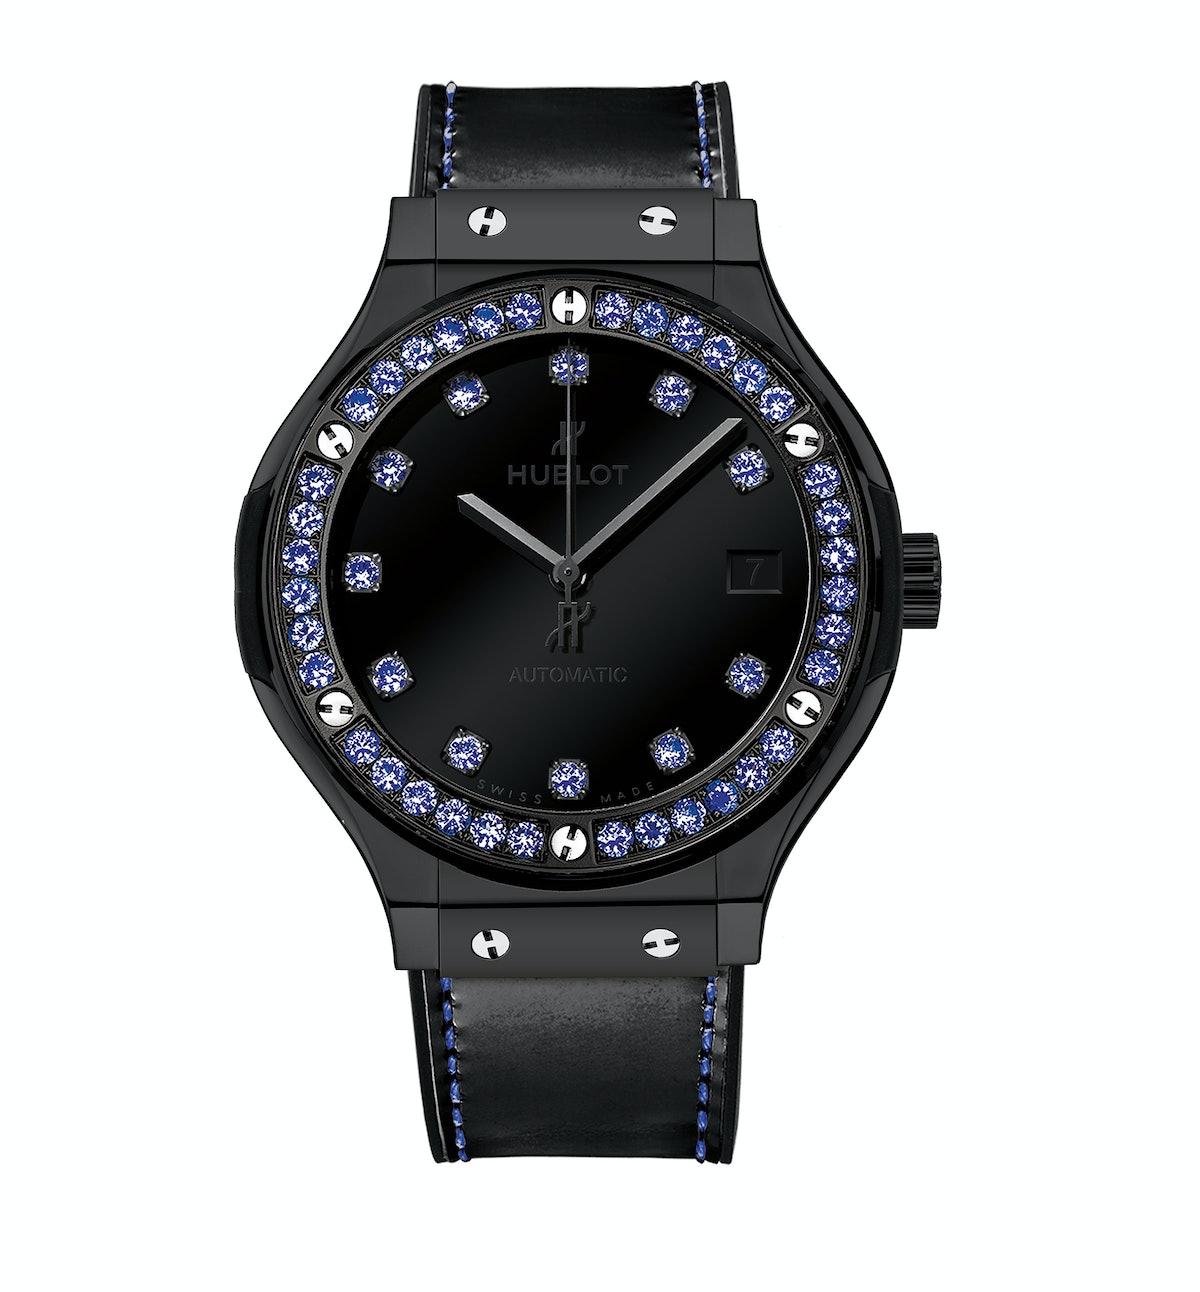 Hublot ceramic and sapphire watch